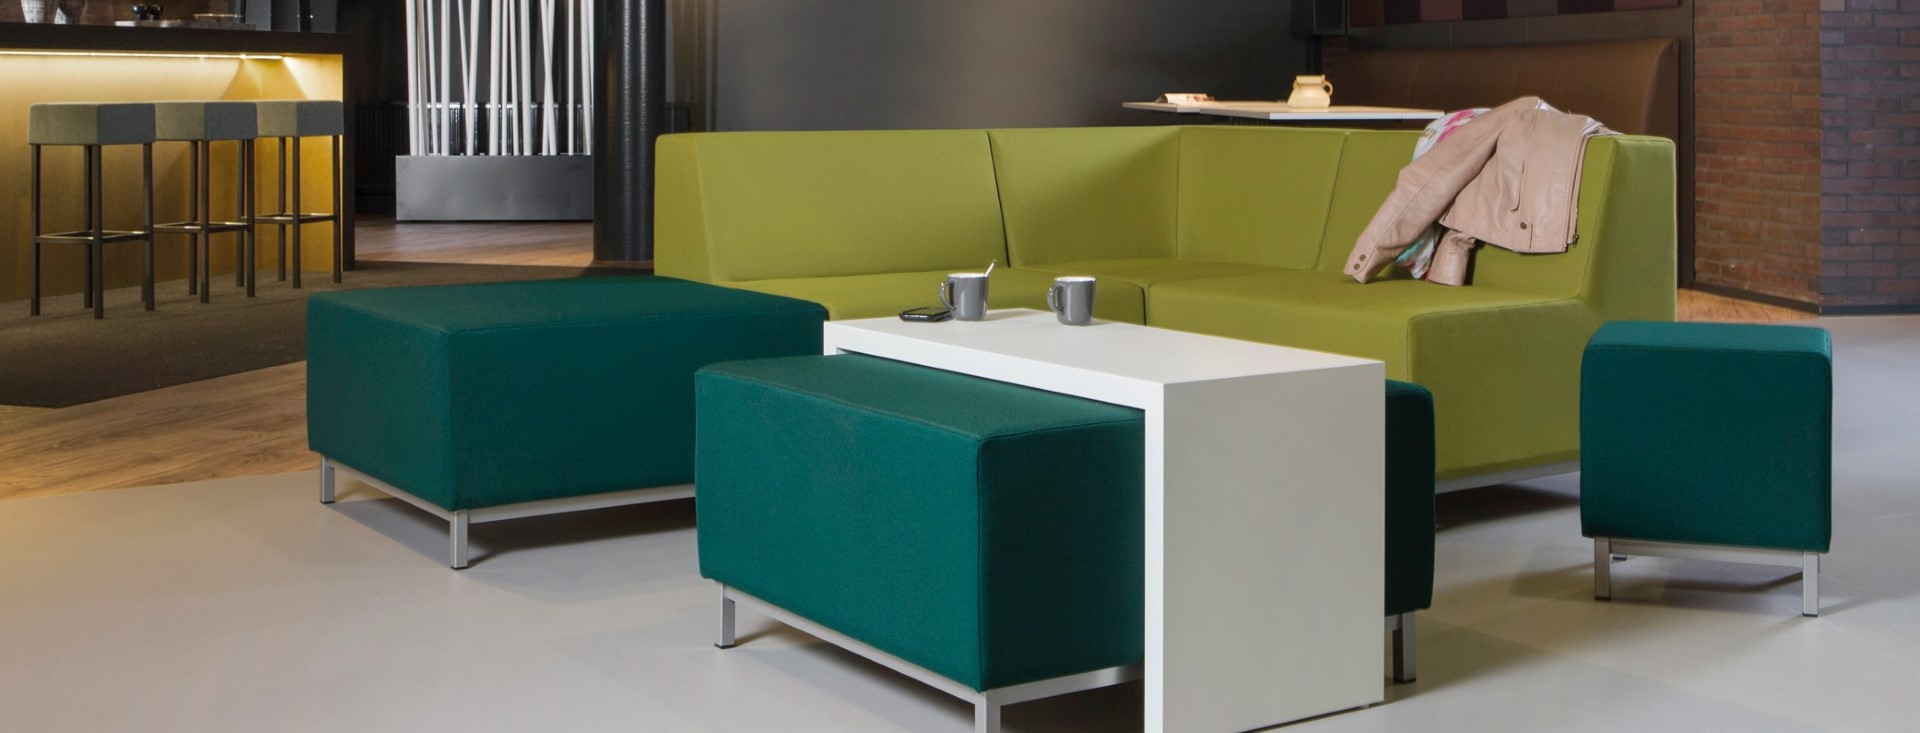 Projectinrichting: meubelmerk Nice Price Office